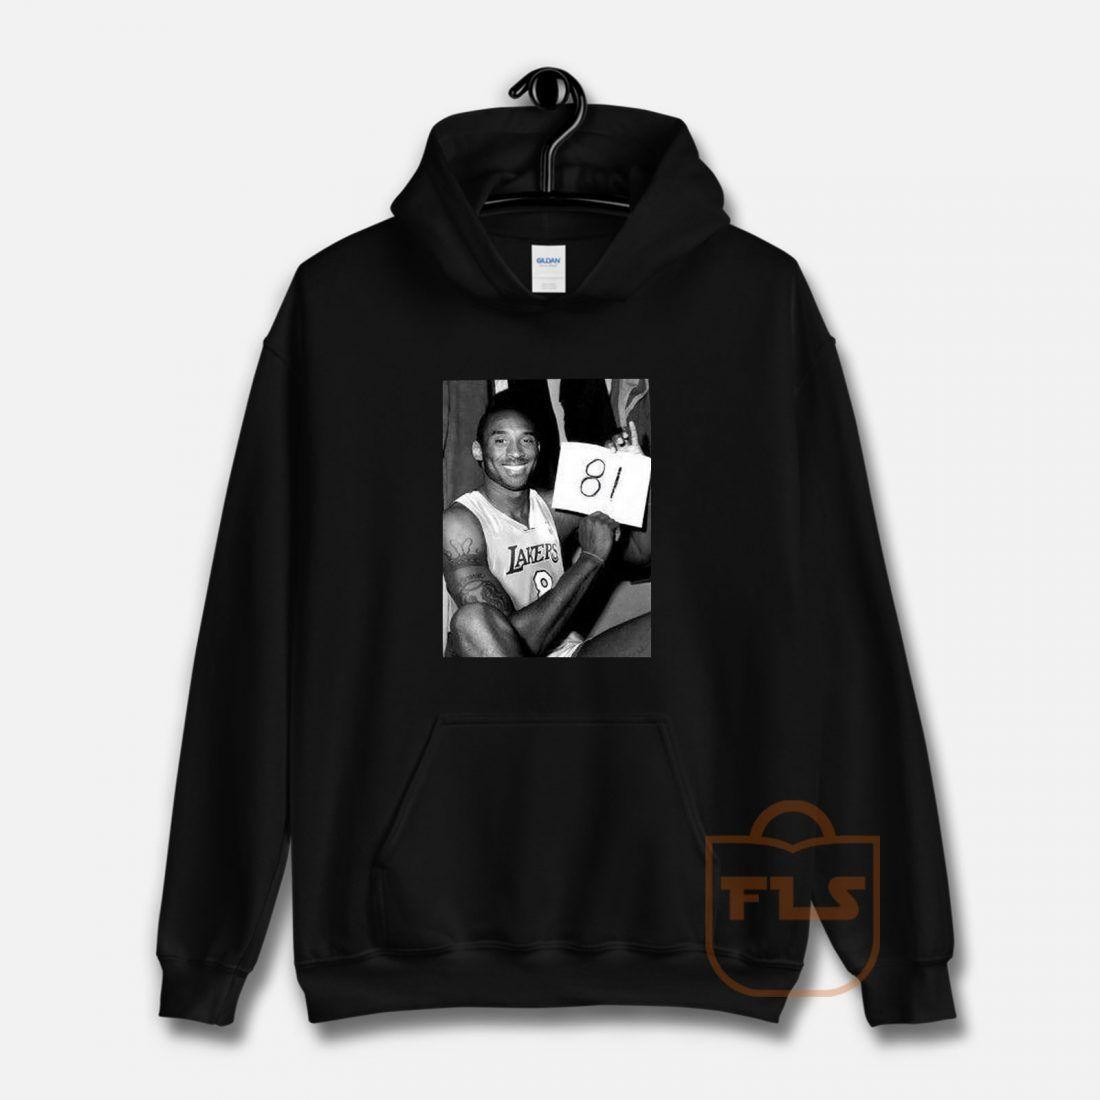 Others Boys Girls Hoodies Kobe-Bryant Hooded Academia Sweatshirts